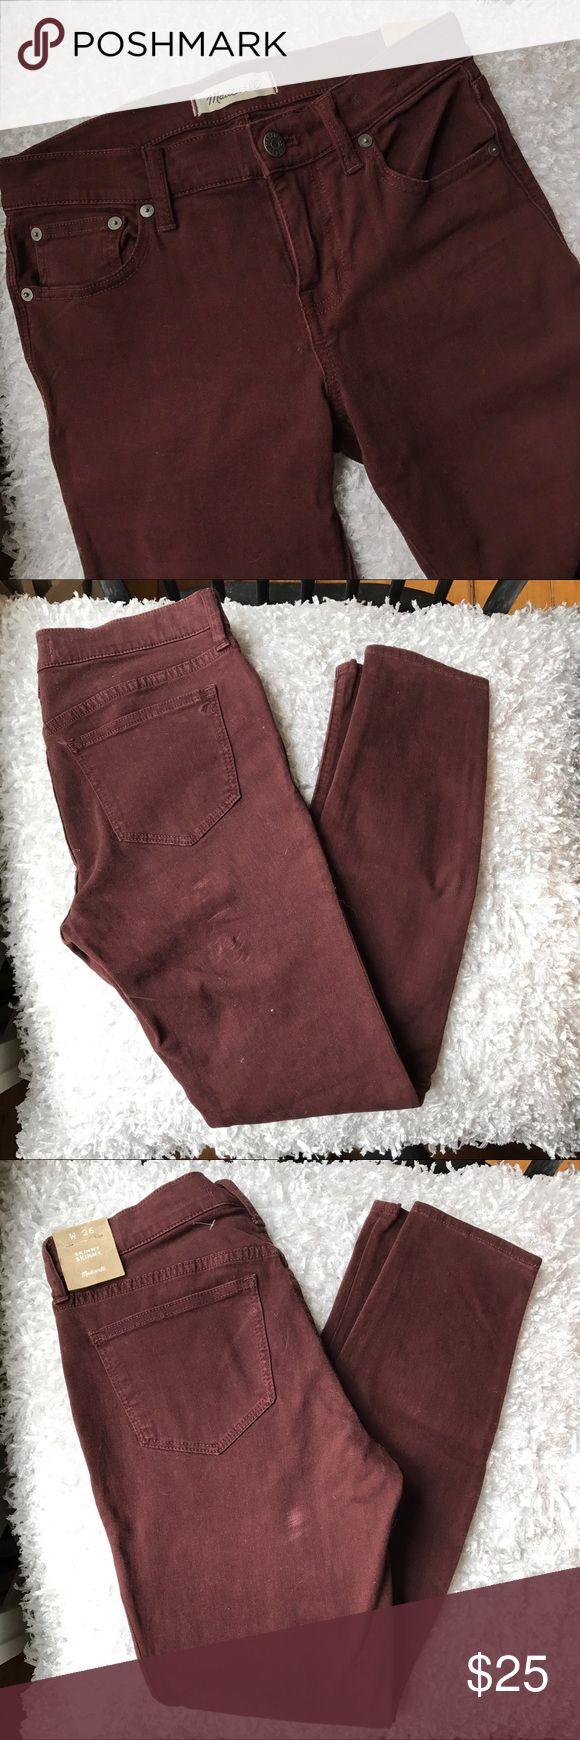 Selling this NWT Madewell maroon skinny jeans on Poshmark! My username is: laurlis. #shopmycloset #poshmark #fashion #shopping #style #forsale #Madewell #Denim